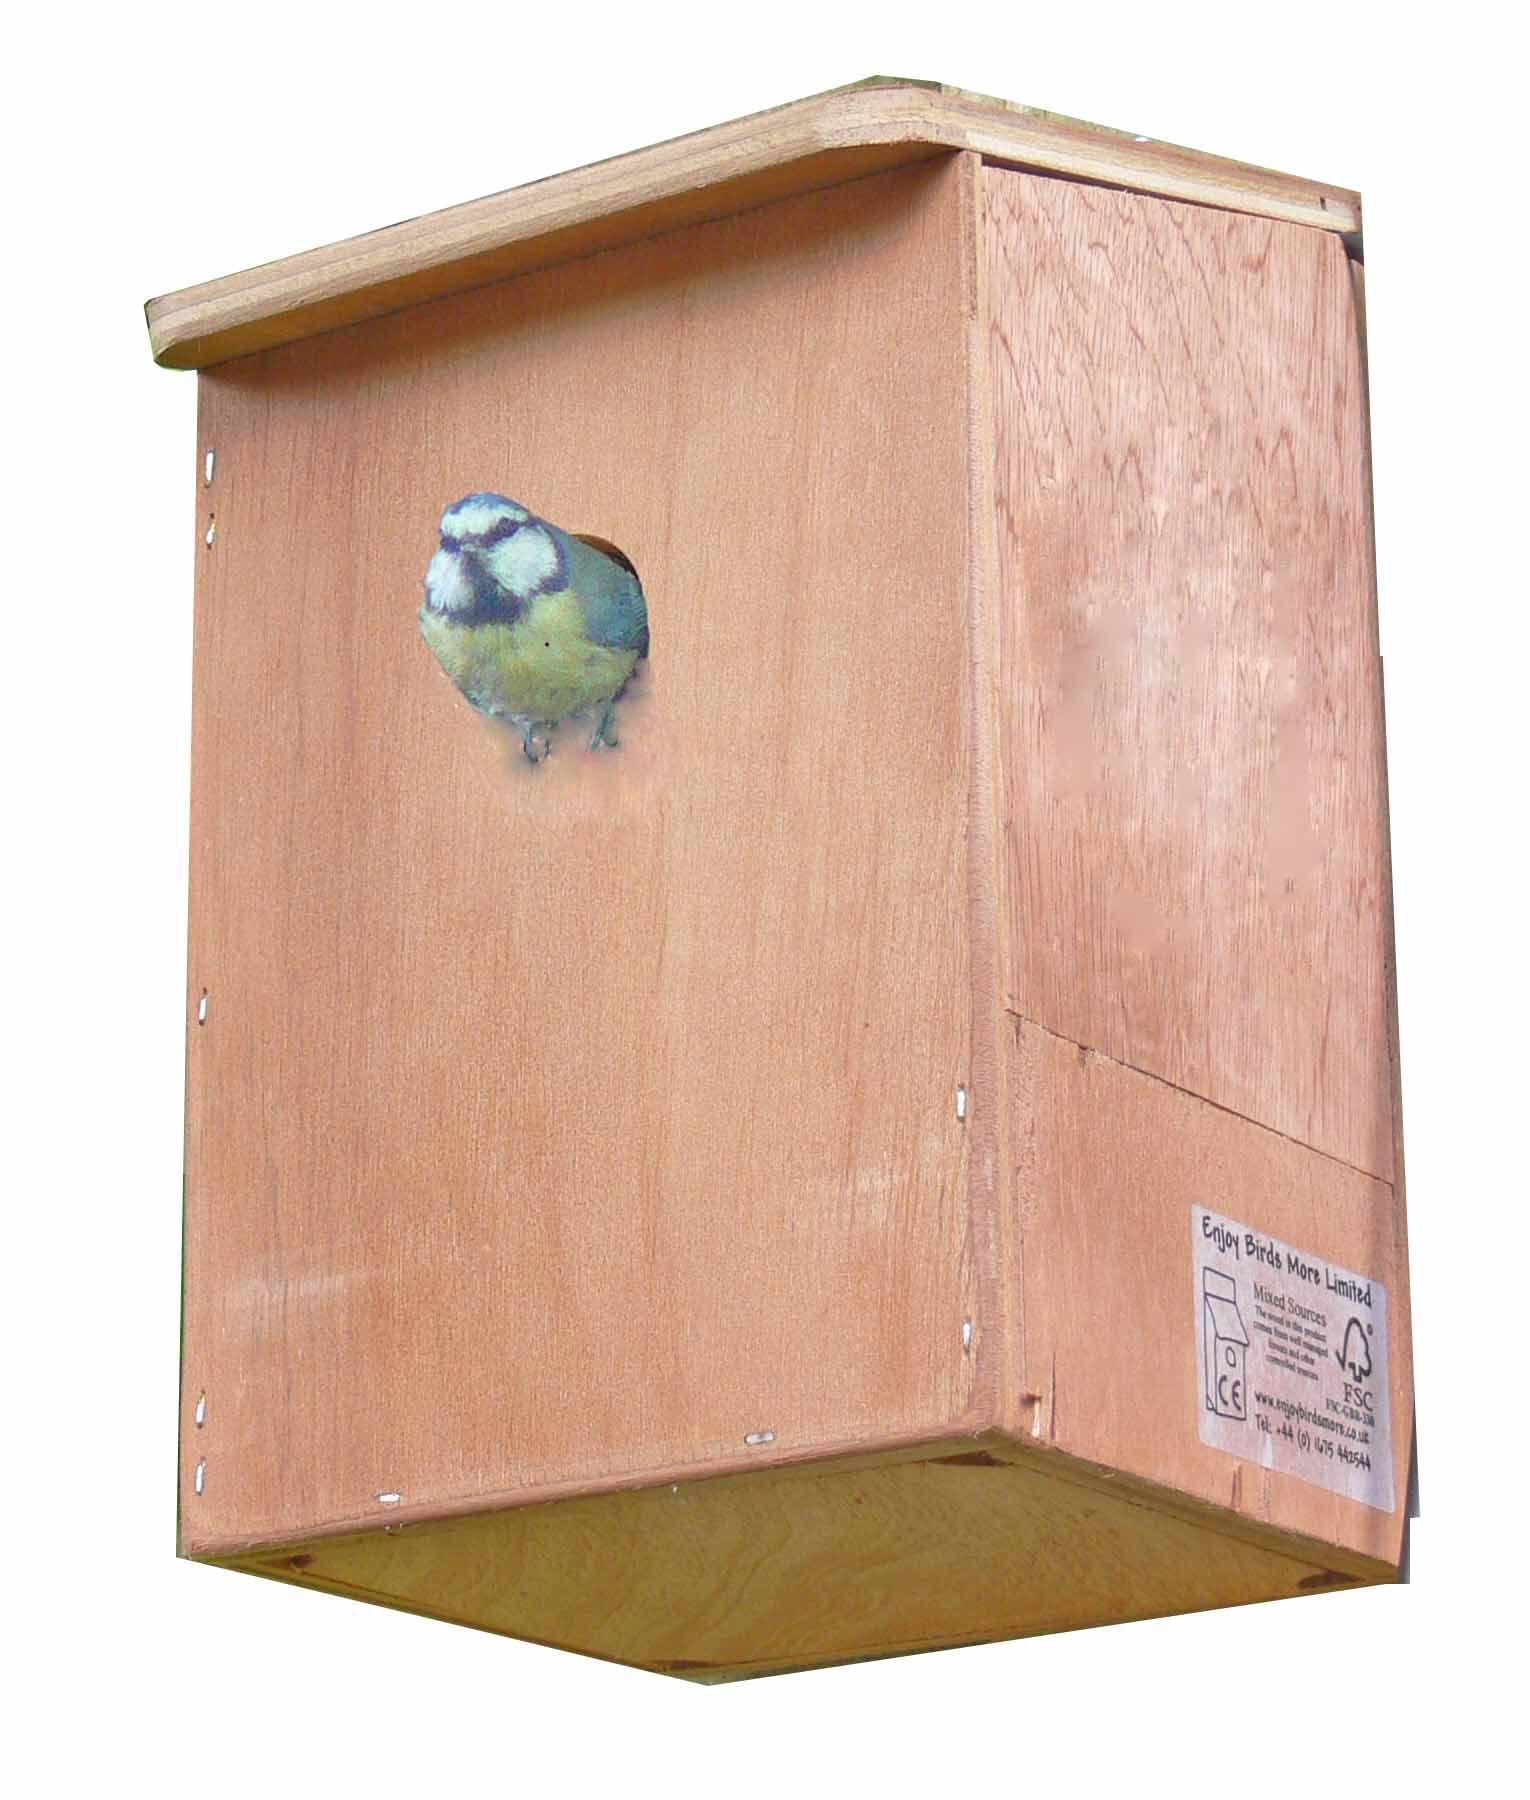 Advanced Wireless Camera Nest Box (With images) Bird box